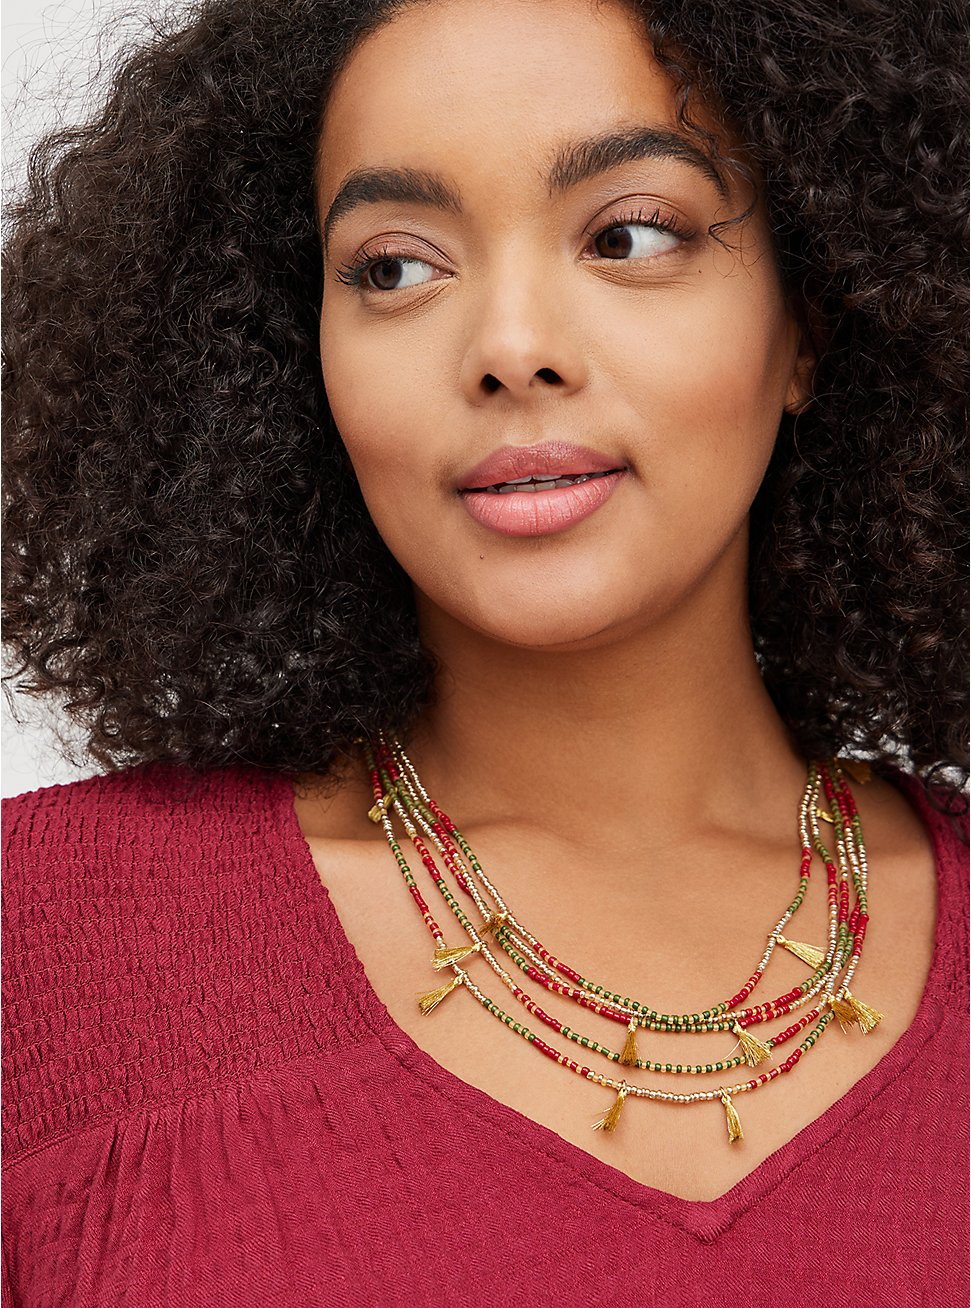 Multilayered Beaded Necklace with Tassels - Burgundy & Olive , , hi-res